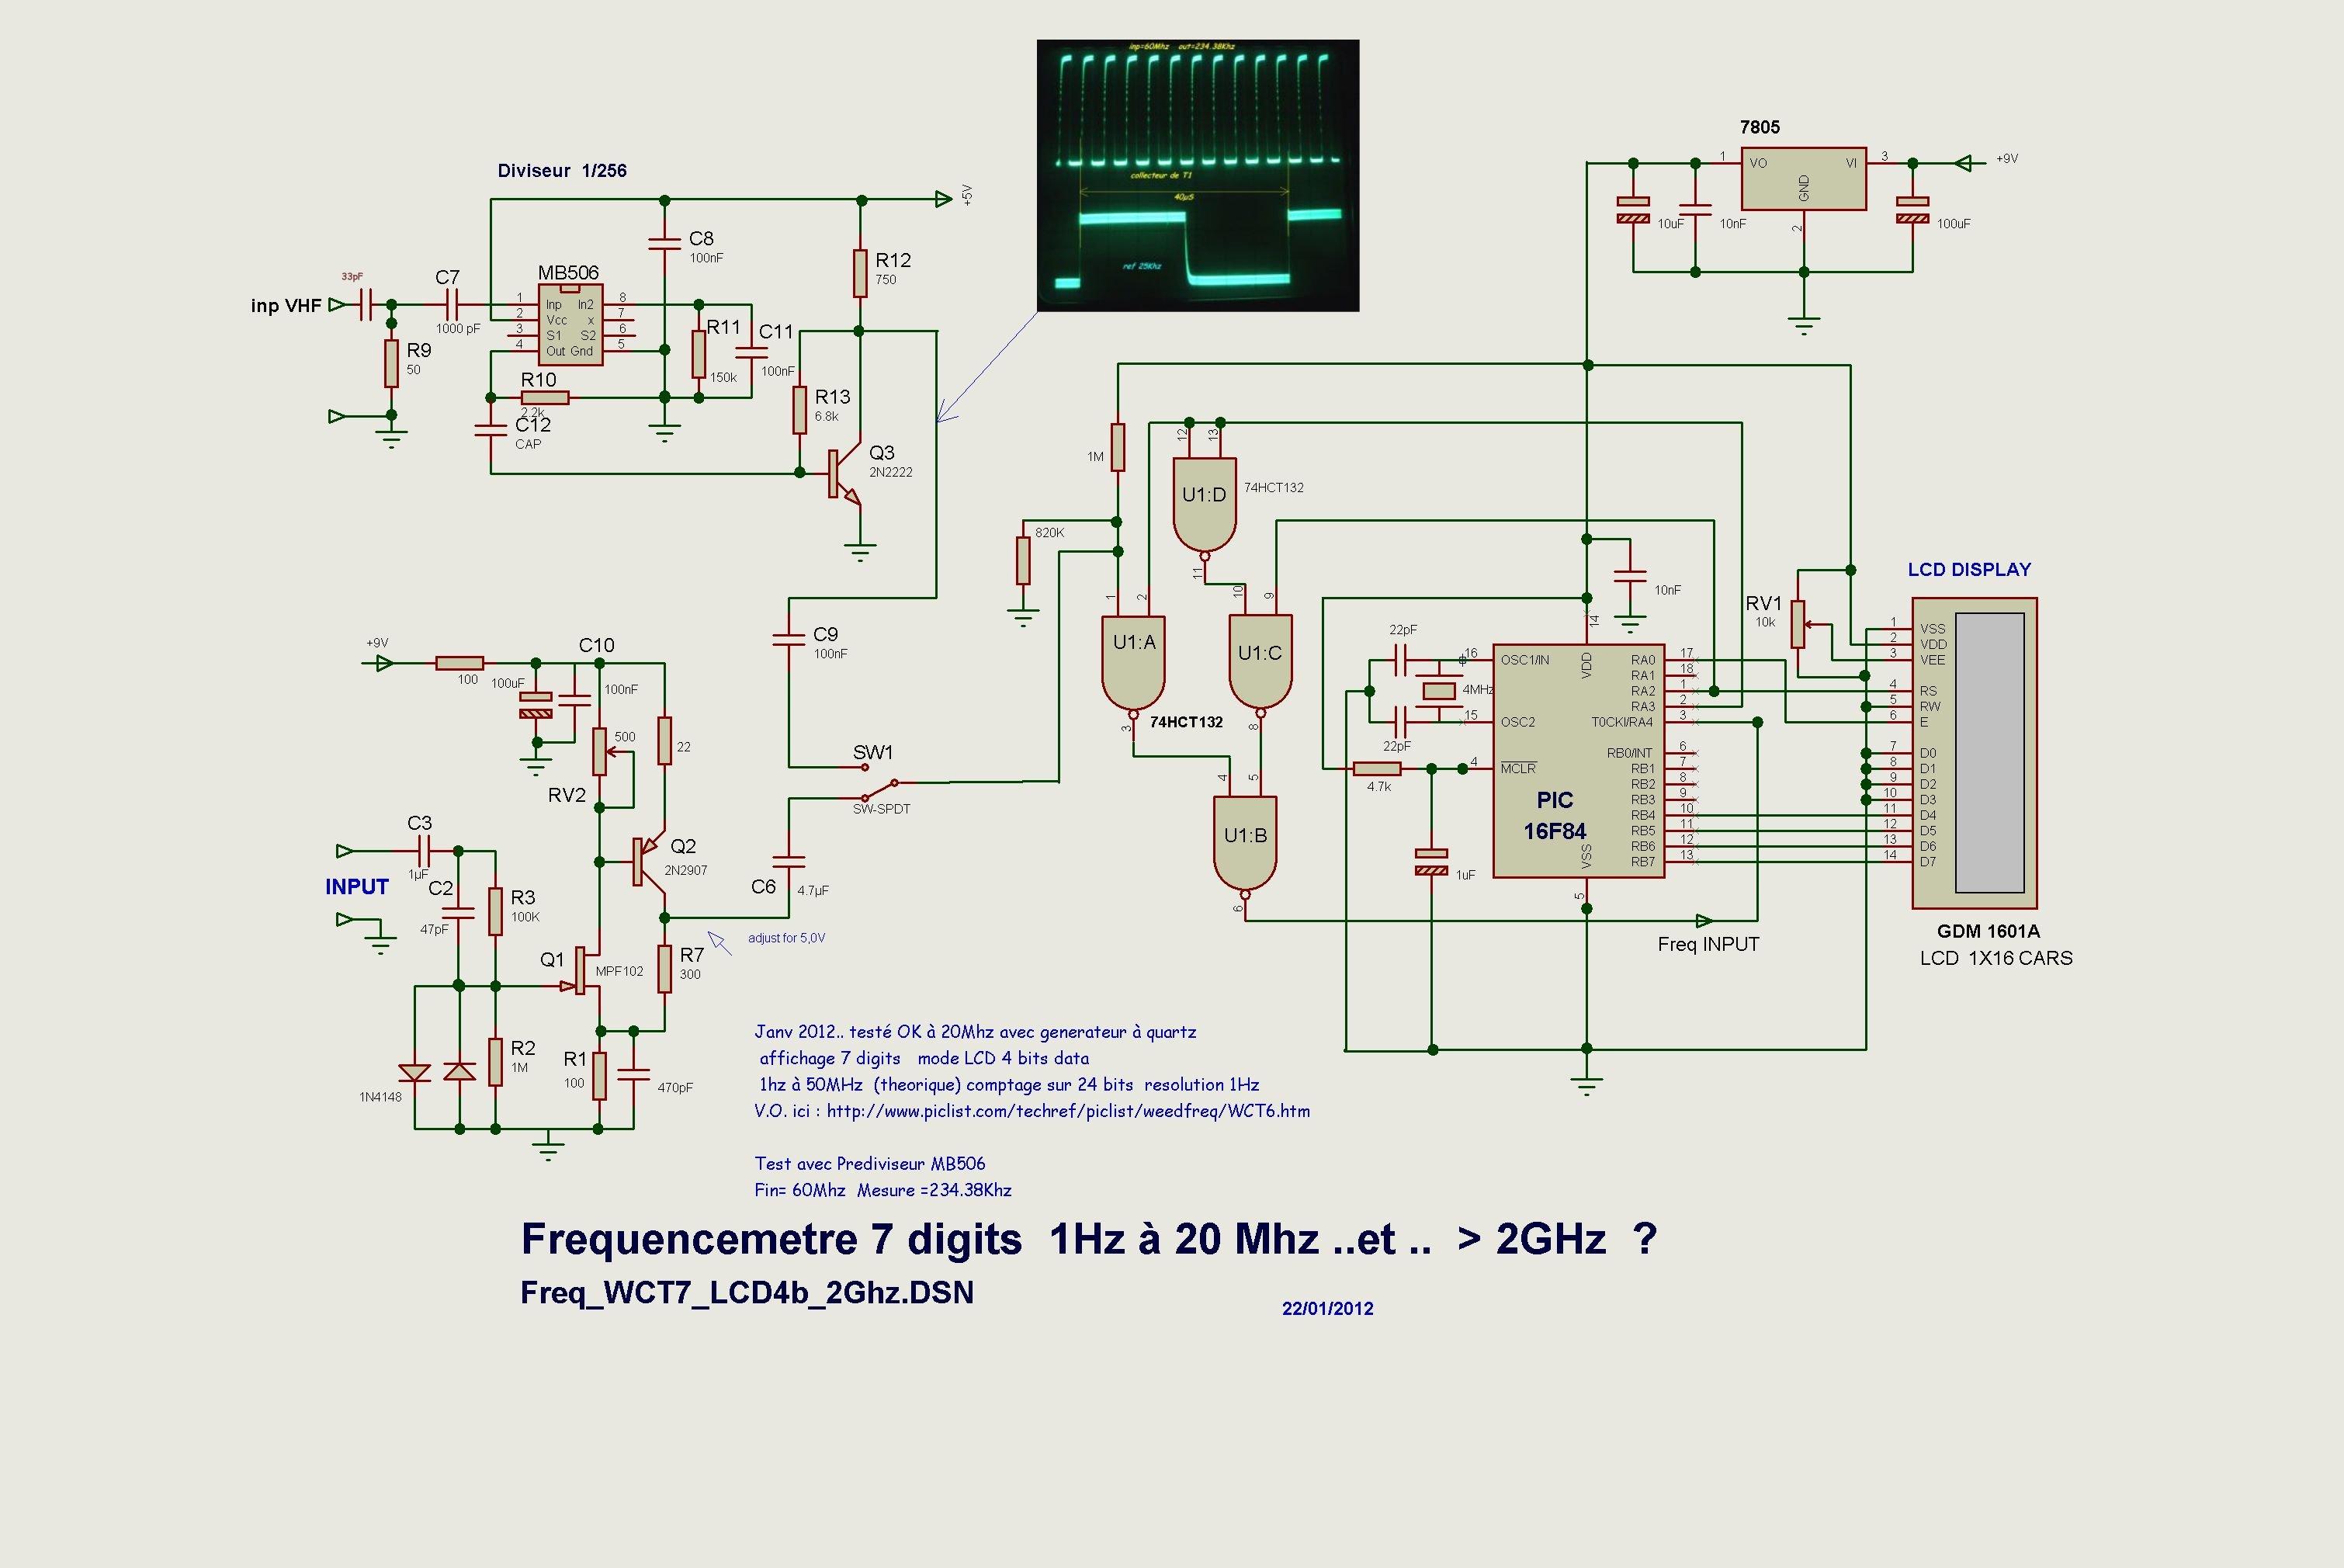 Frequencemetre Avec Microcontroller Pic 7805 Schema Freq Wct7 Lcd4b 1ghz 1 Proto Wct6